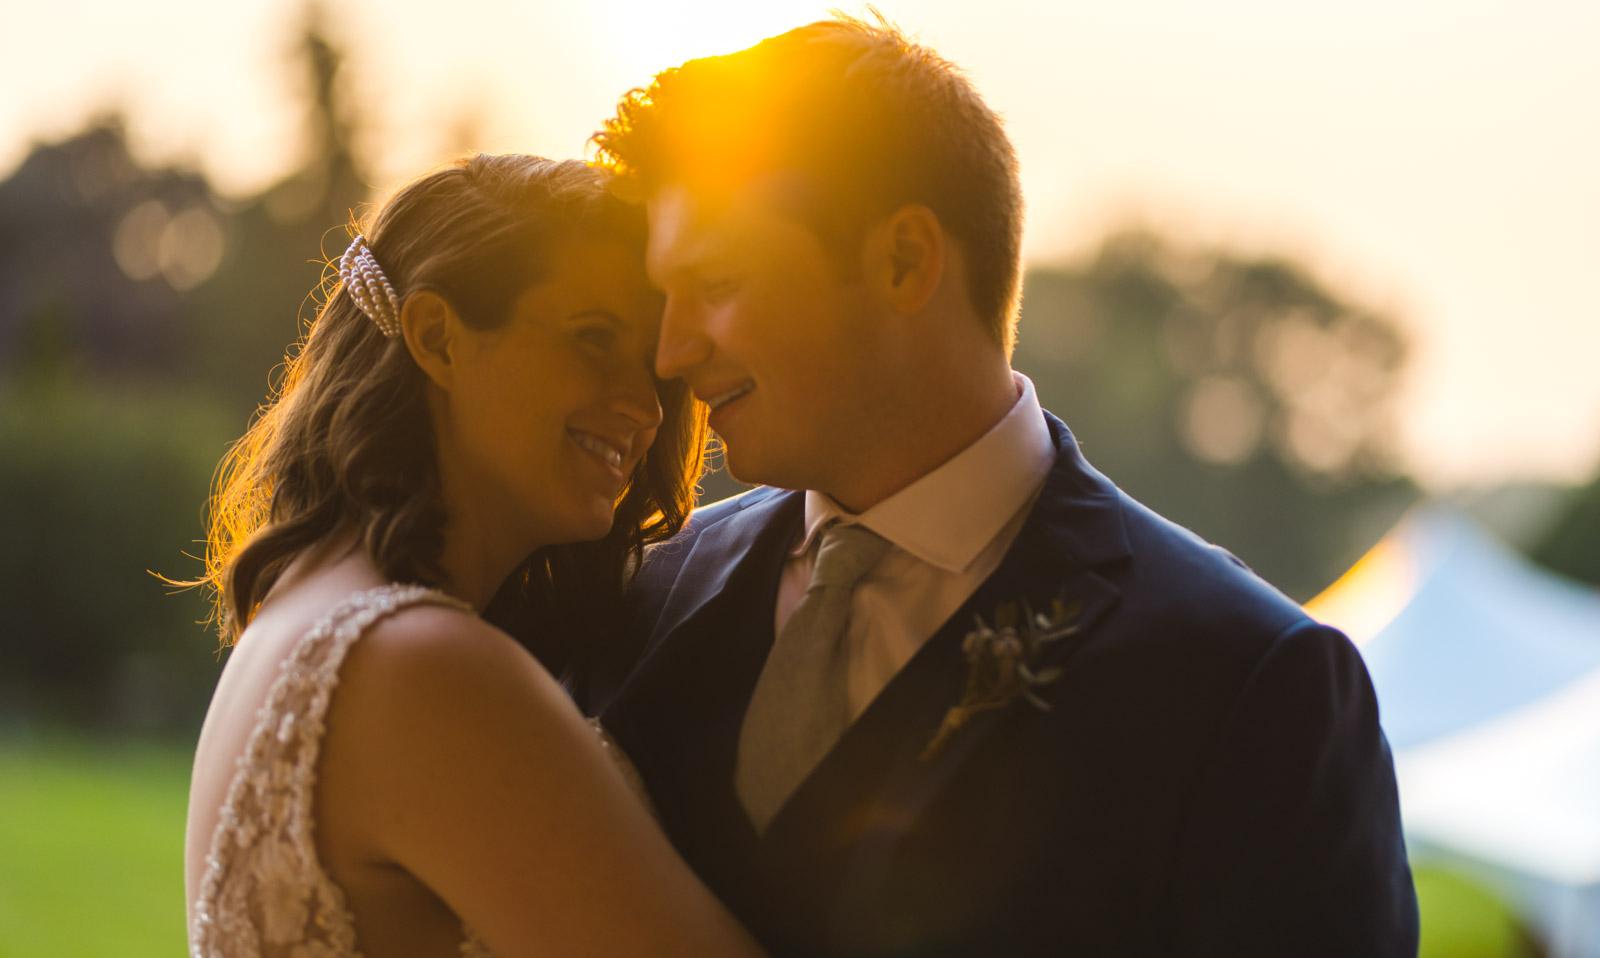 Emerson & Elicia's Golf Course Wedding Aidan & Leanne Hennebry Hamilton Wedding Videographers Photographers Niagara Hush Hush Photography & Film-63.jpg